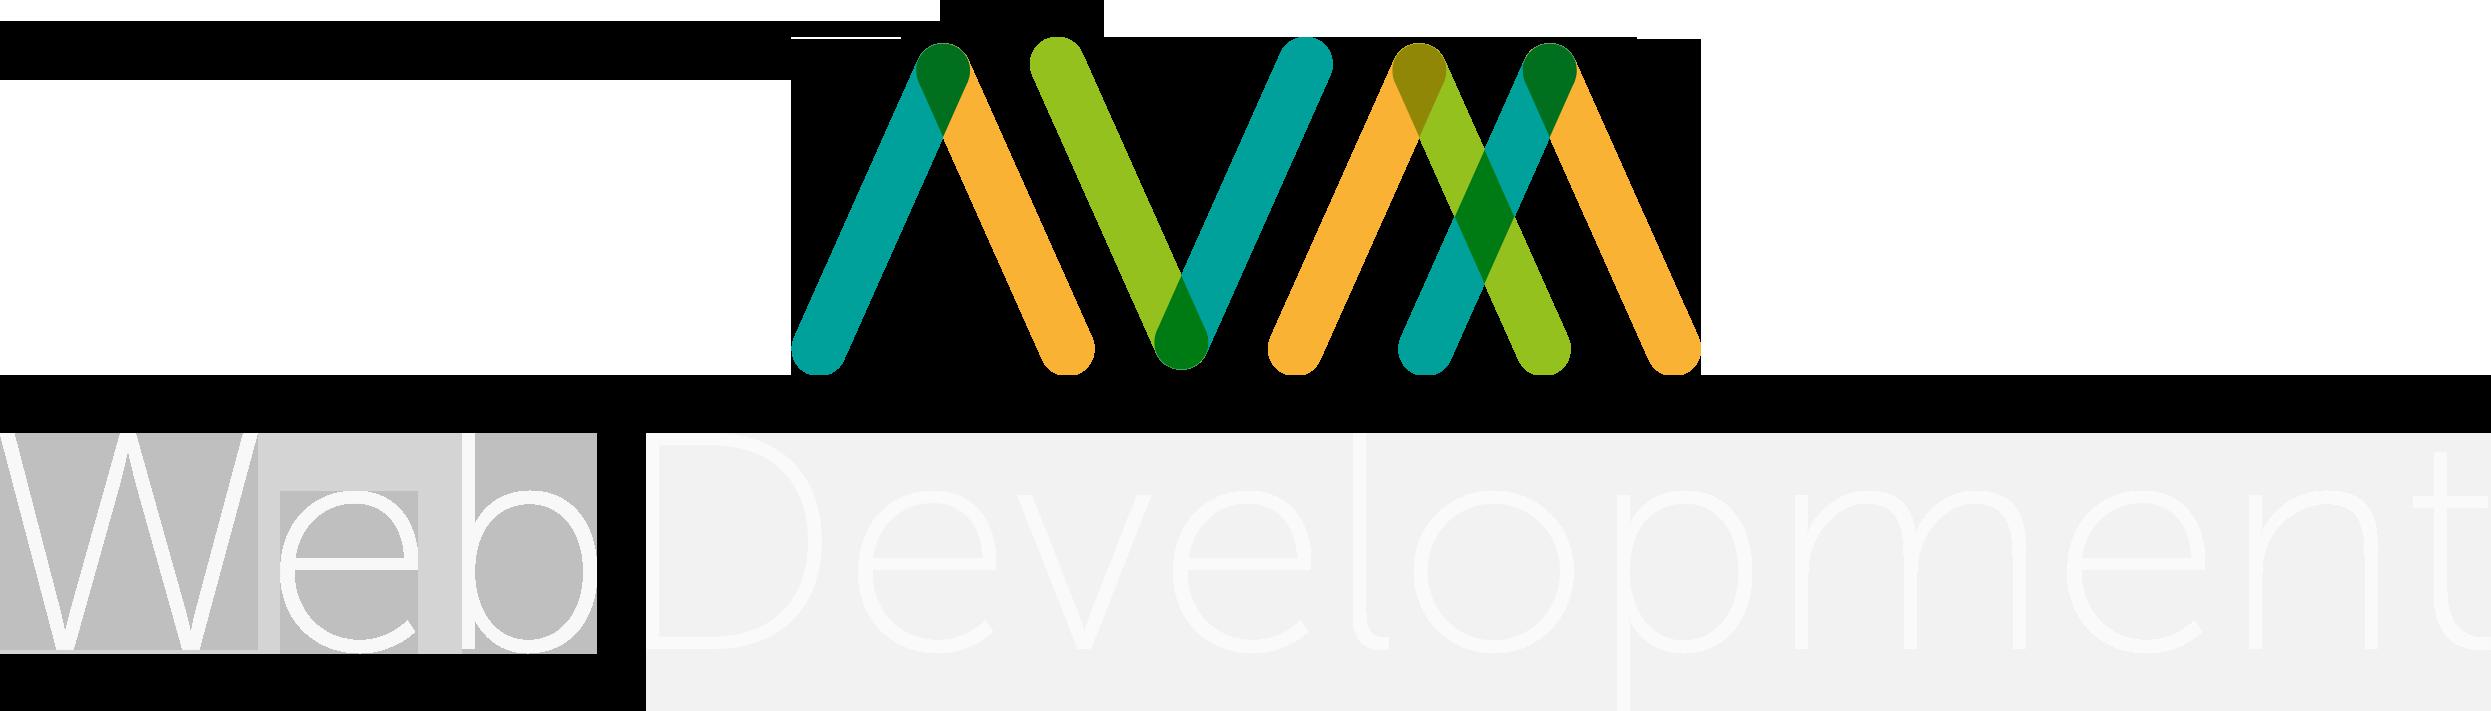 Alvaro Villafane-Molina Web Developer